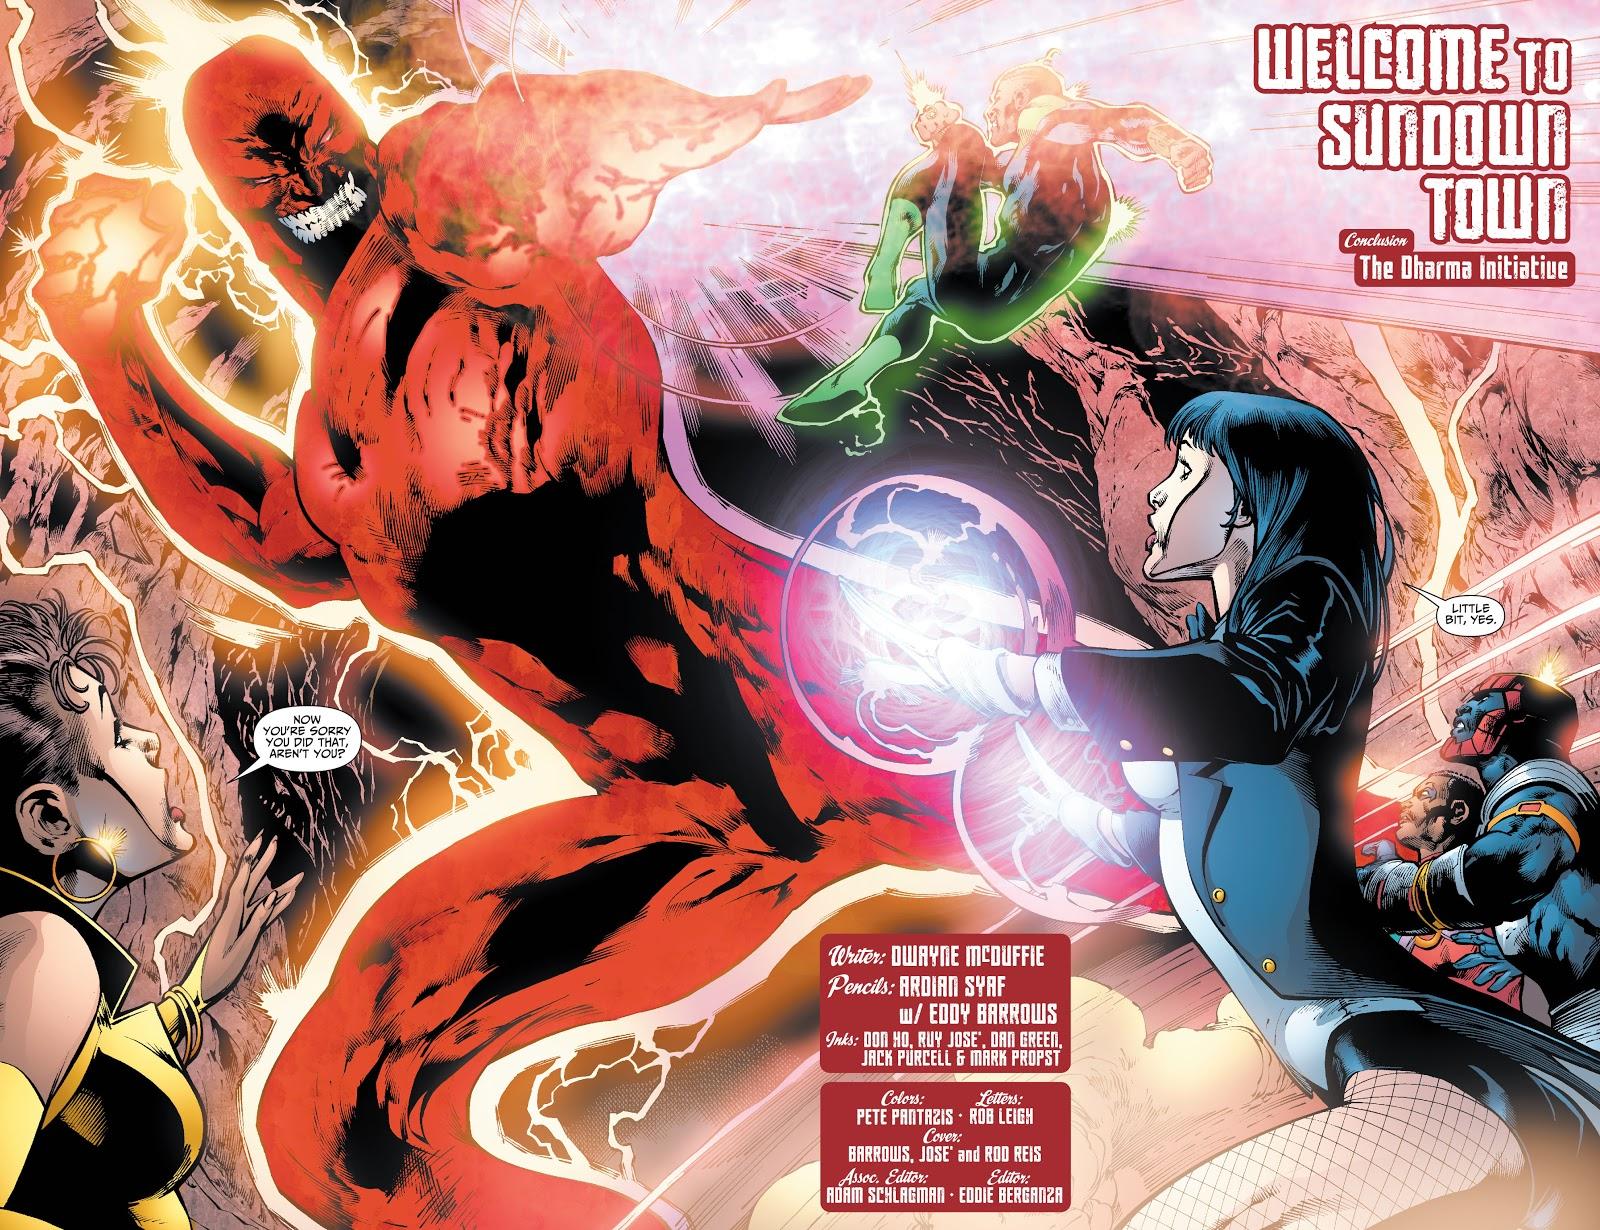 Justice League of America Vol. 2 #34